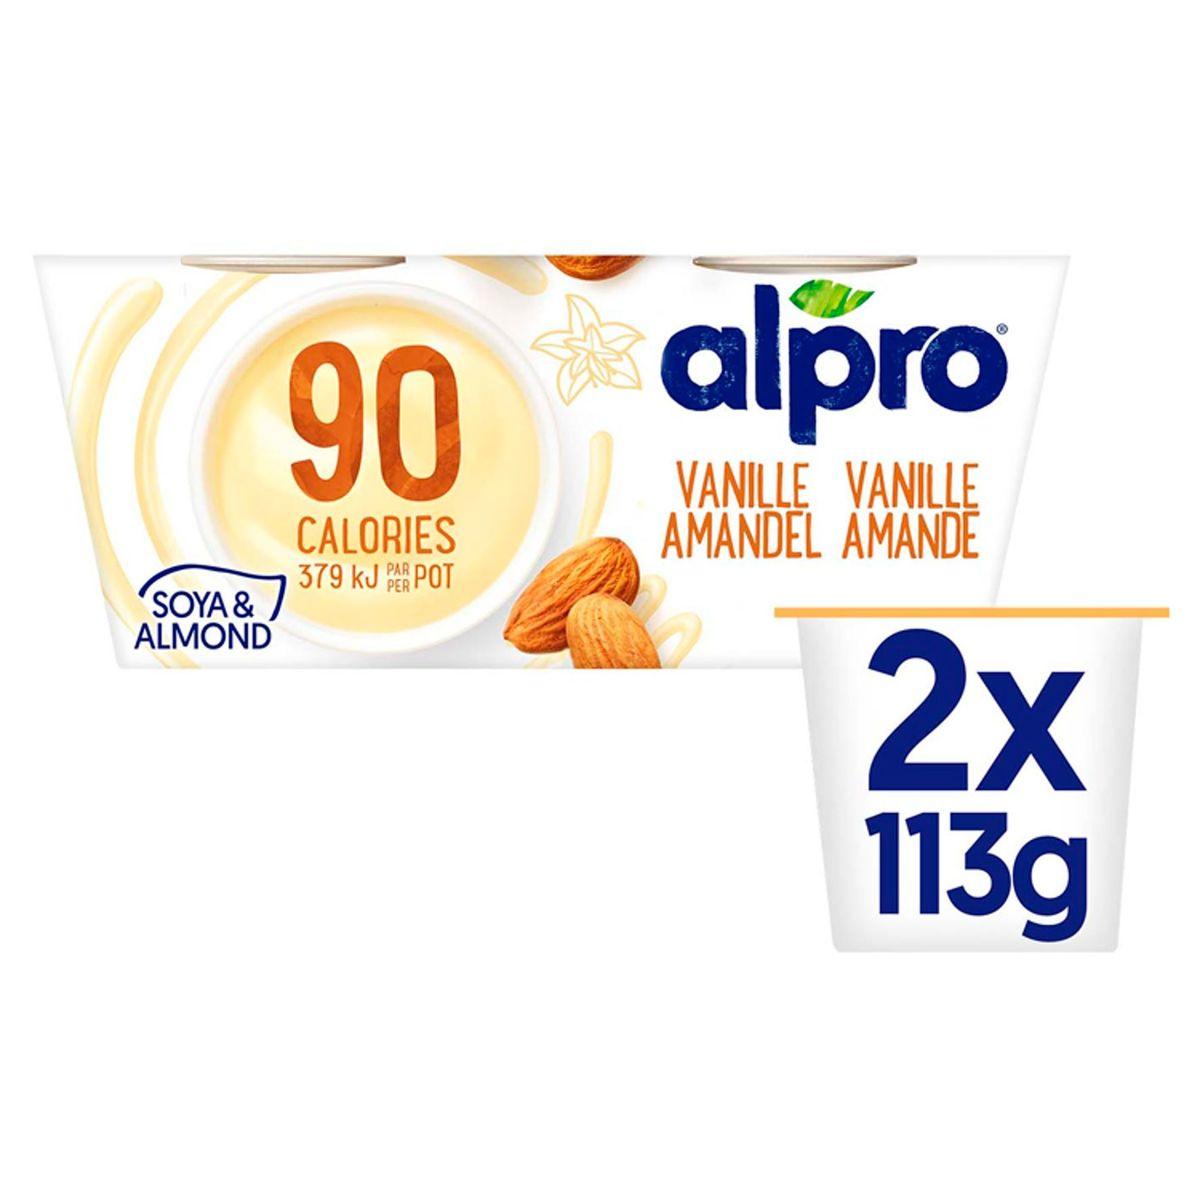 Alpro 90 Kcal Vanille-Amandel Dessert 2 x 113 g